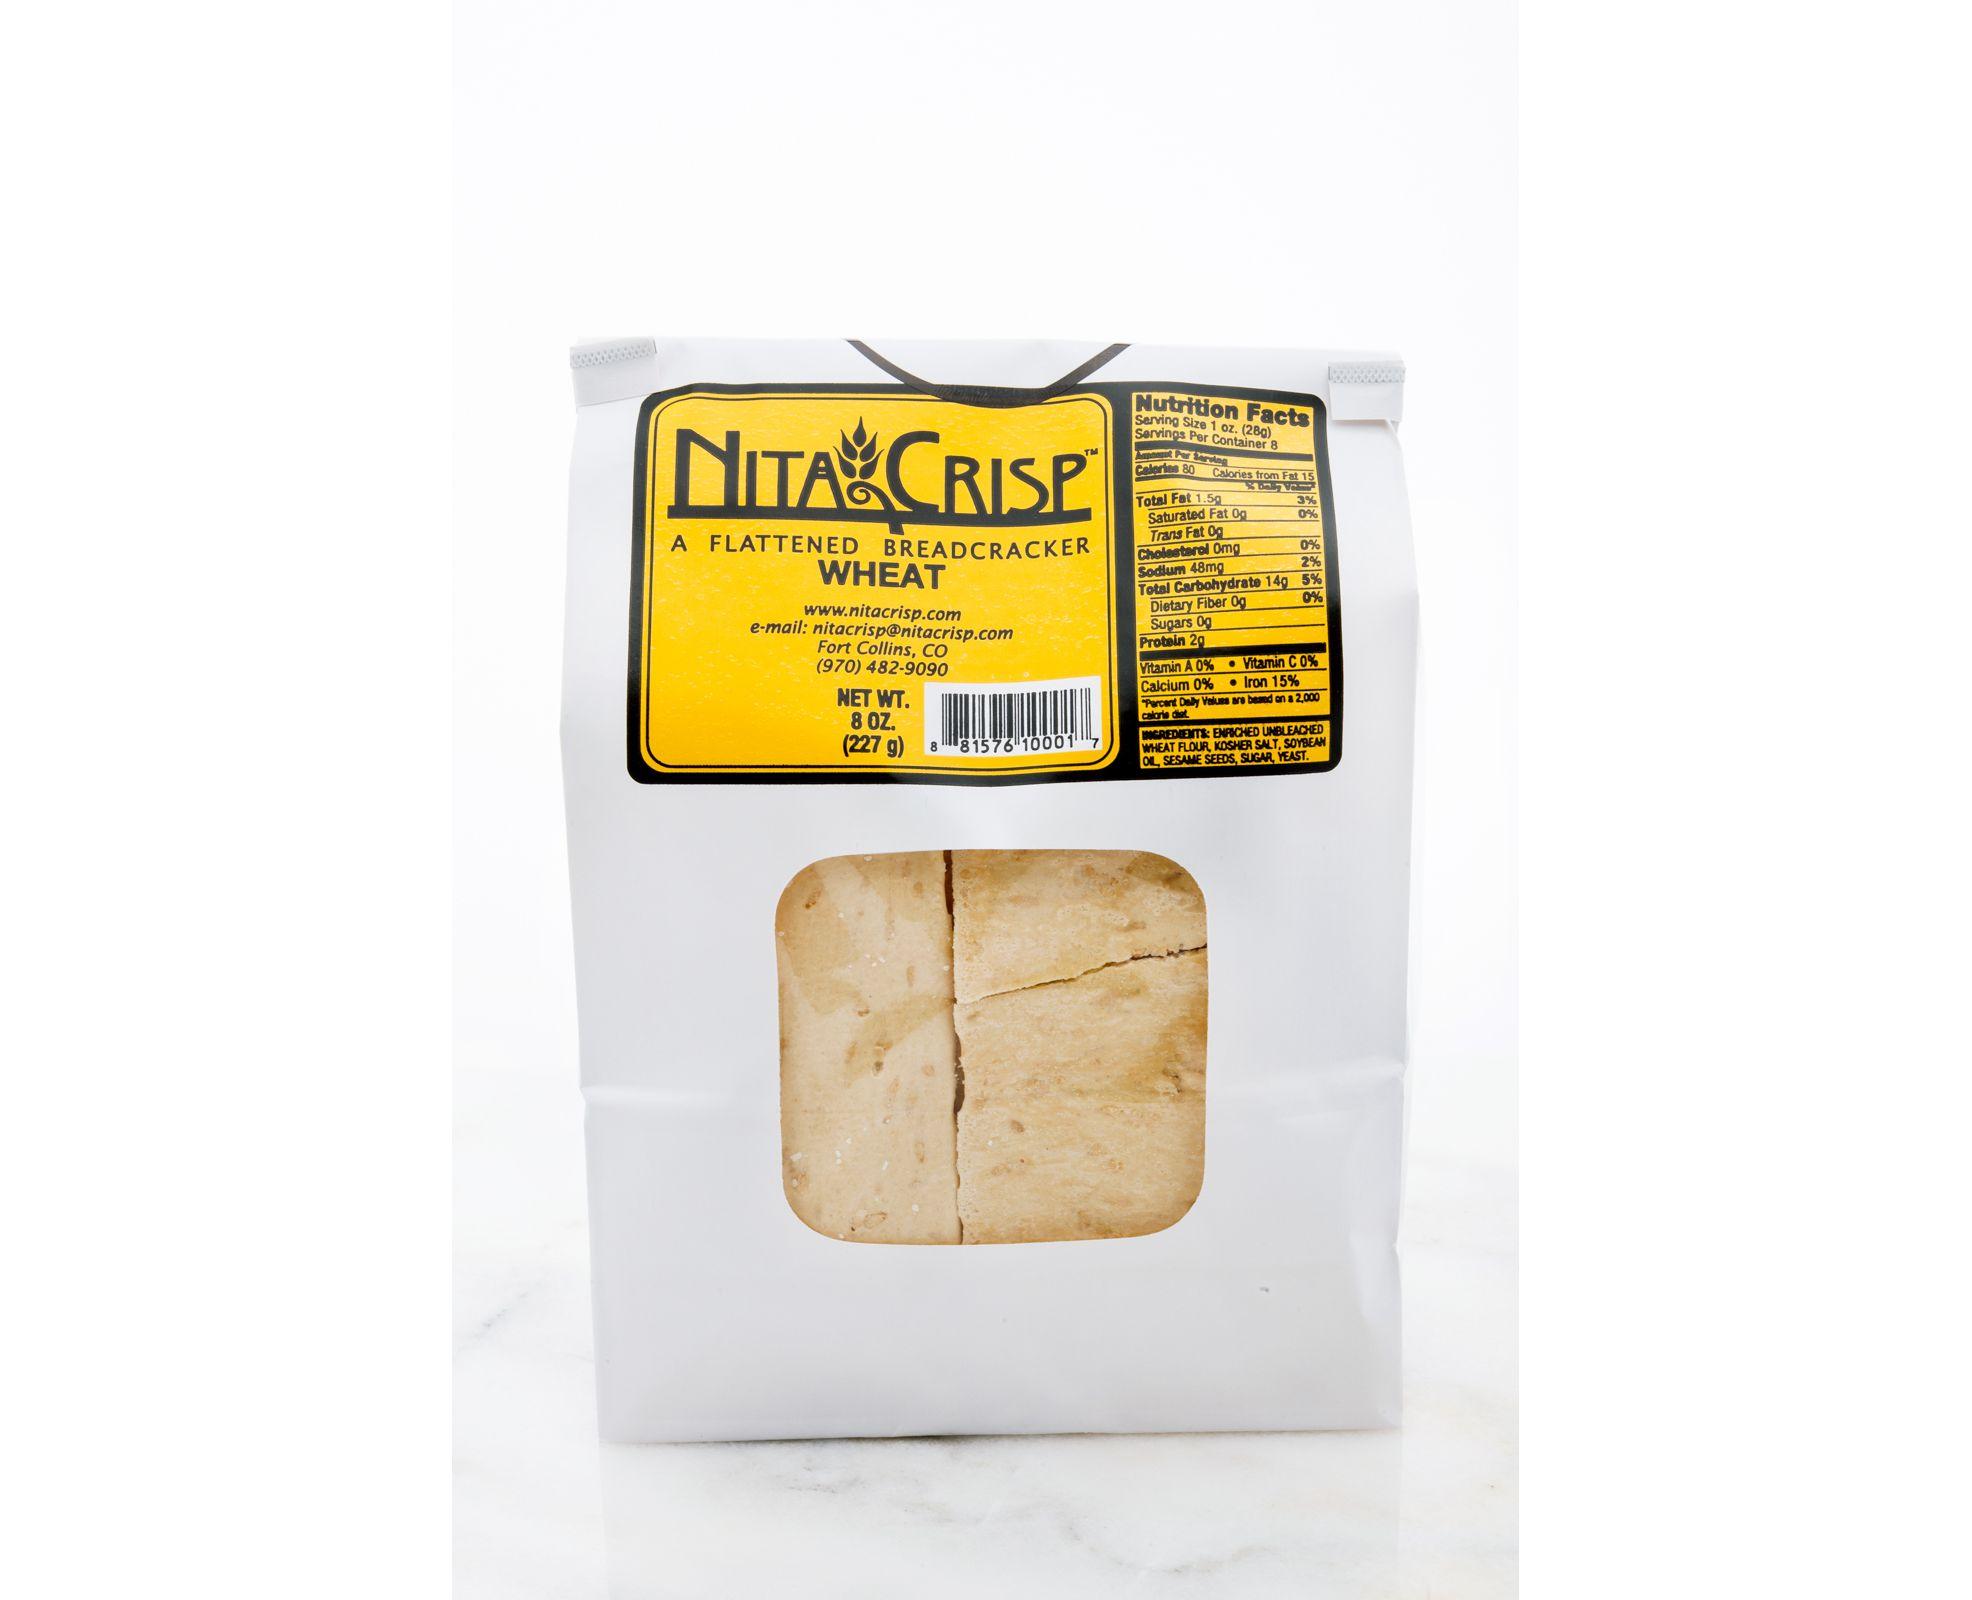 Nita-Crisp-Wheat_x8iv-0j